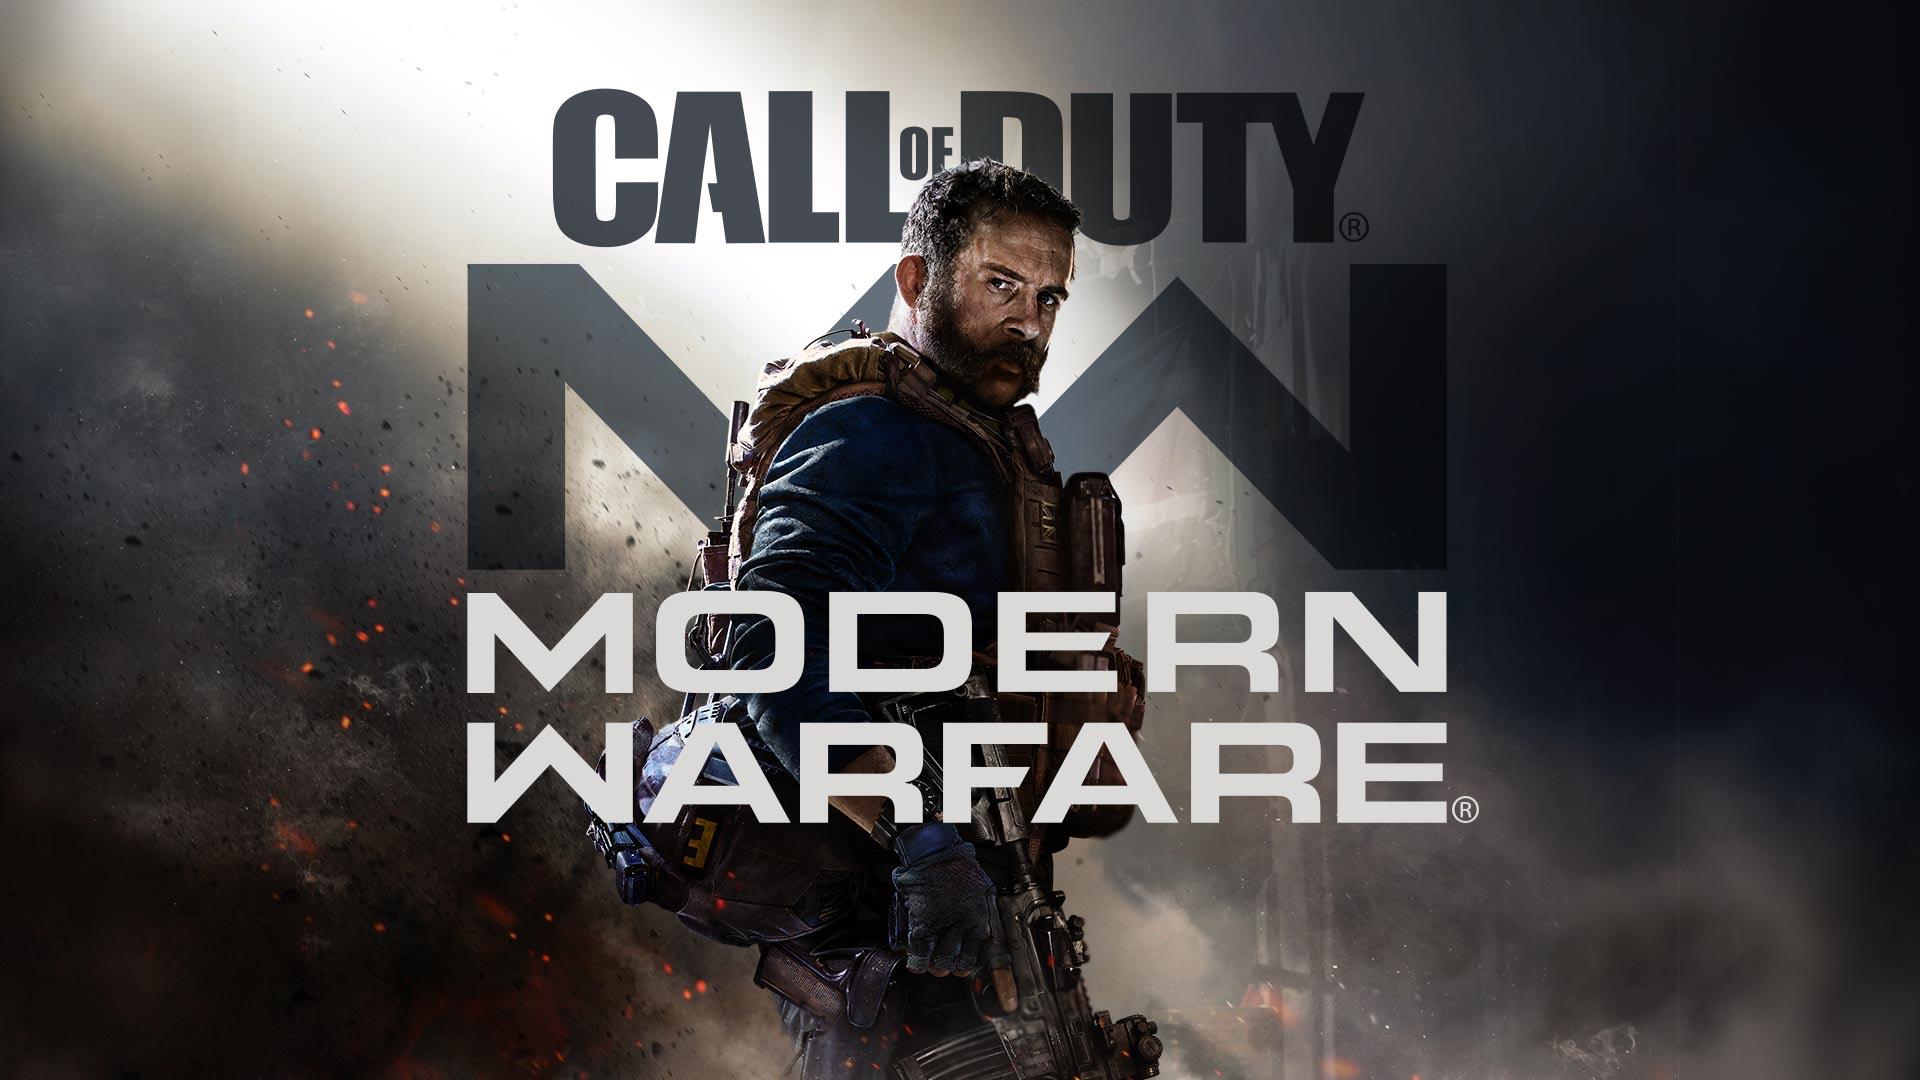 Call of duty Modern Warfare PC 2019 a menos de 40€